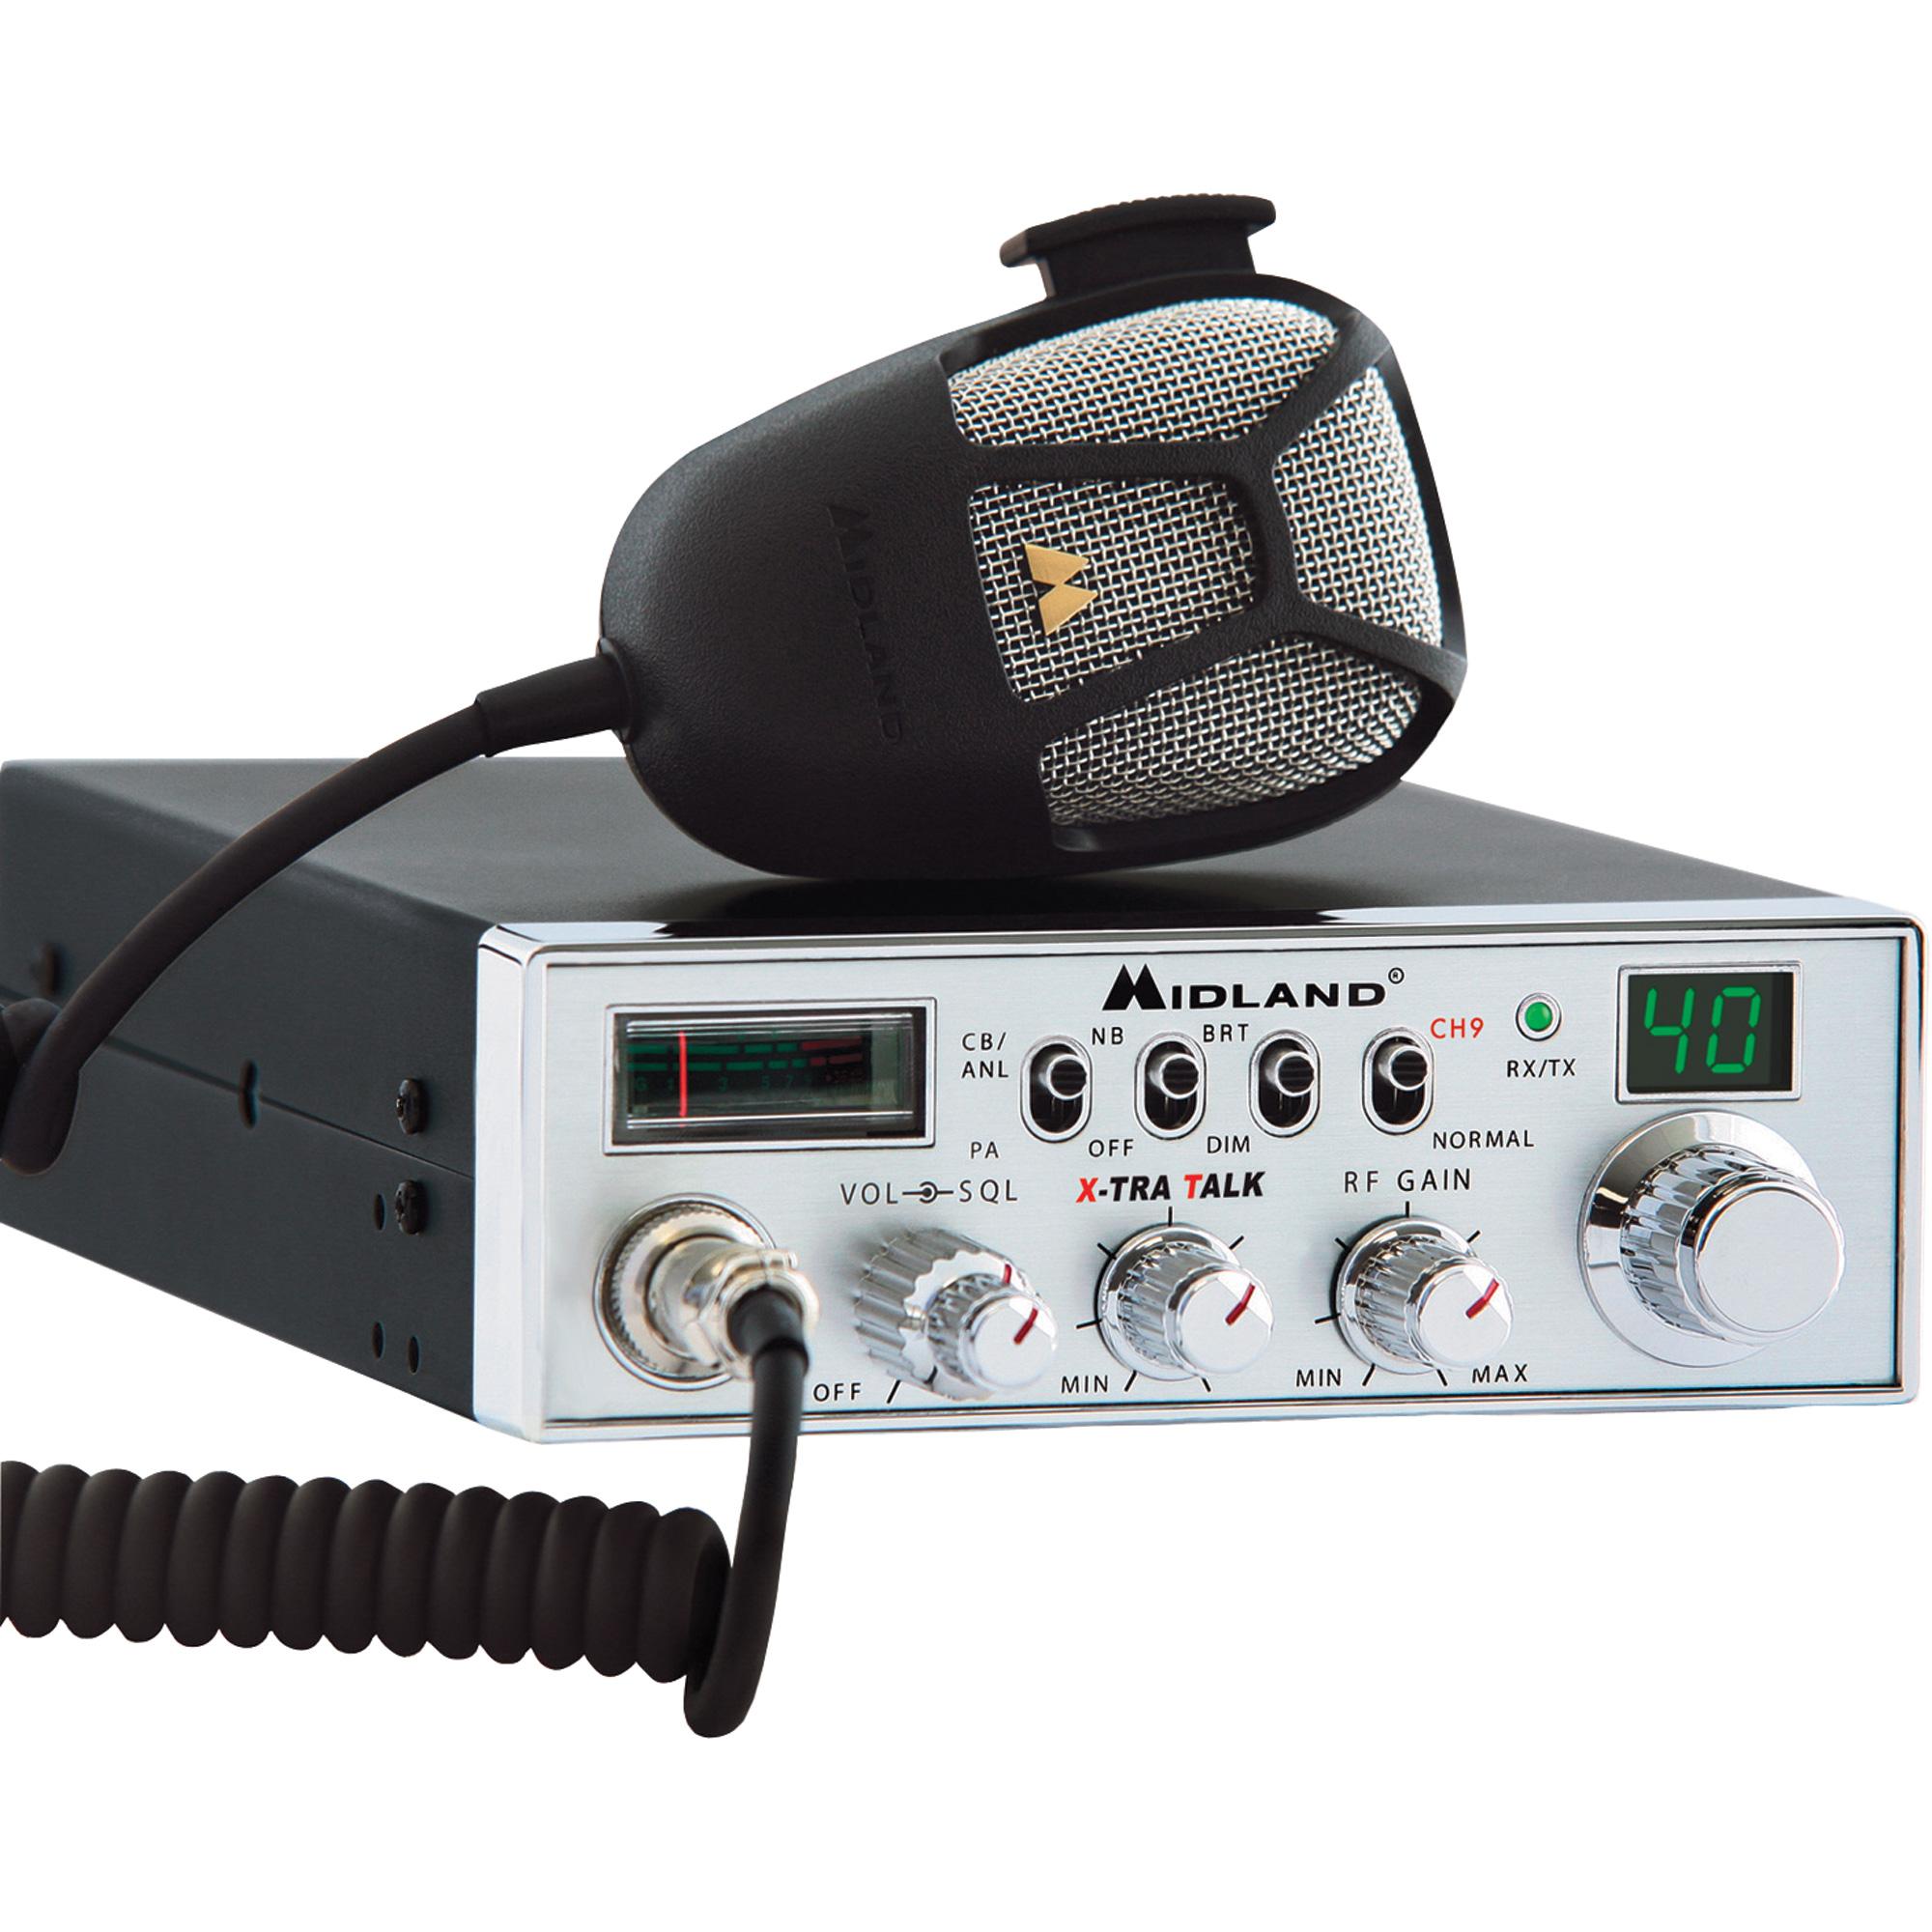 Mobile CB Radios